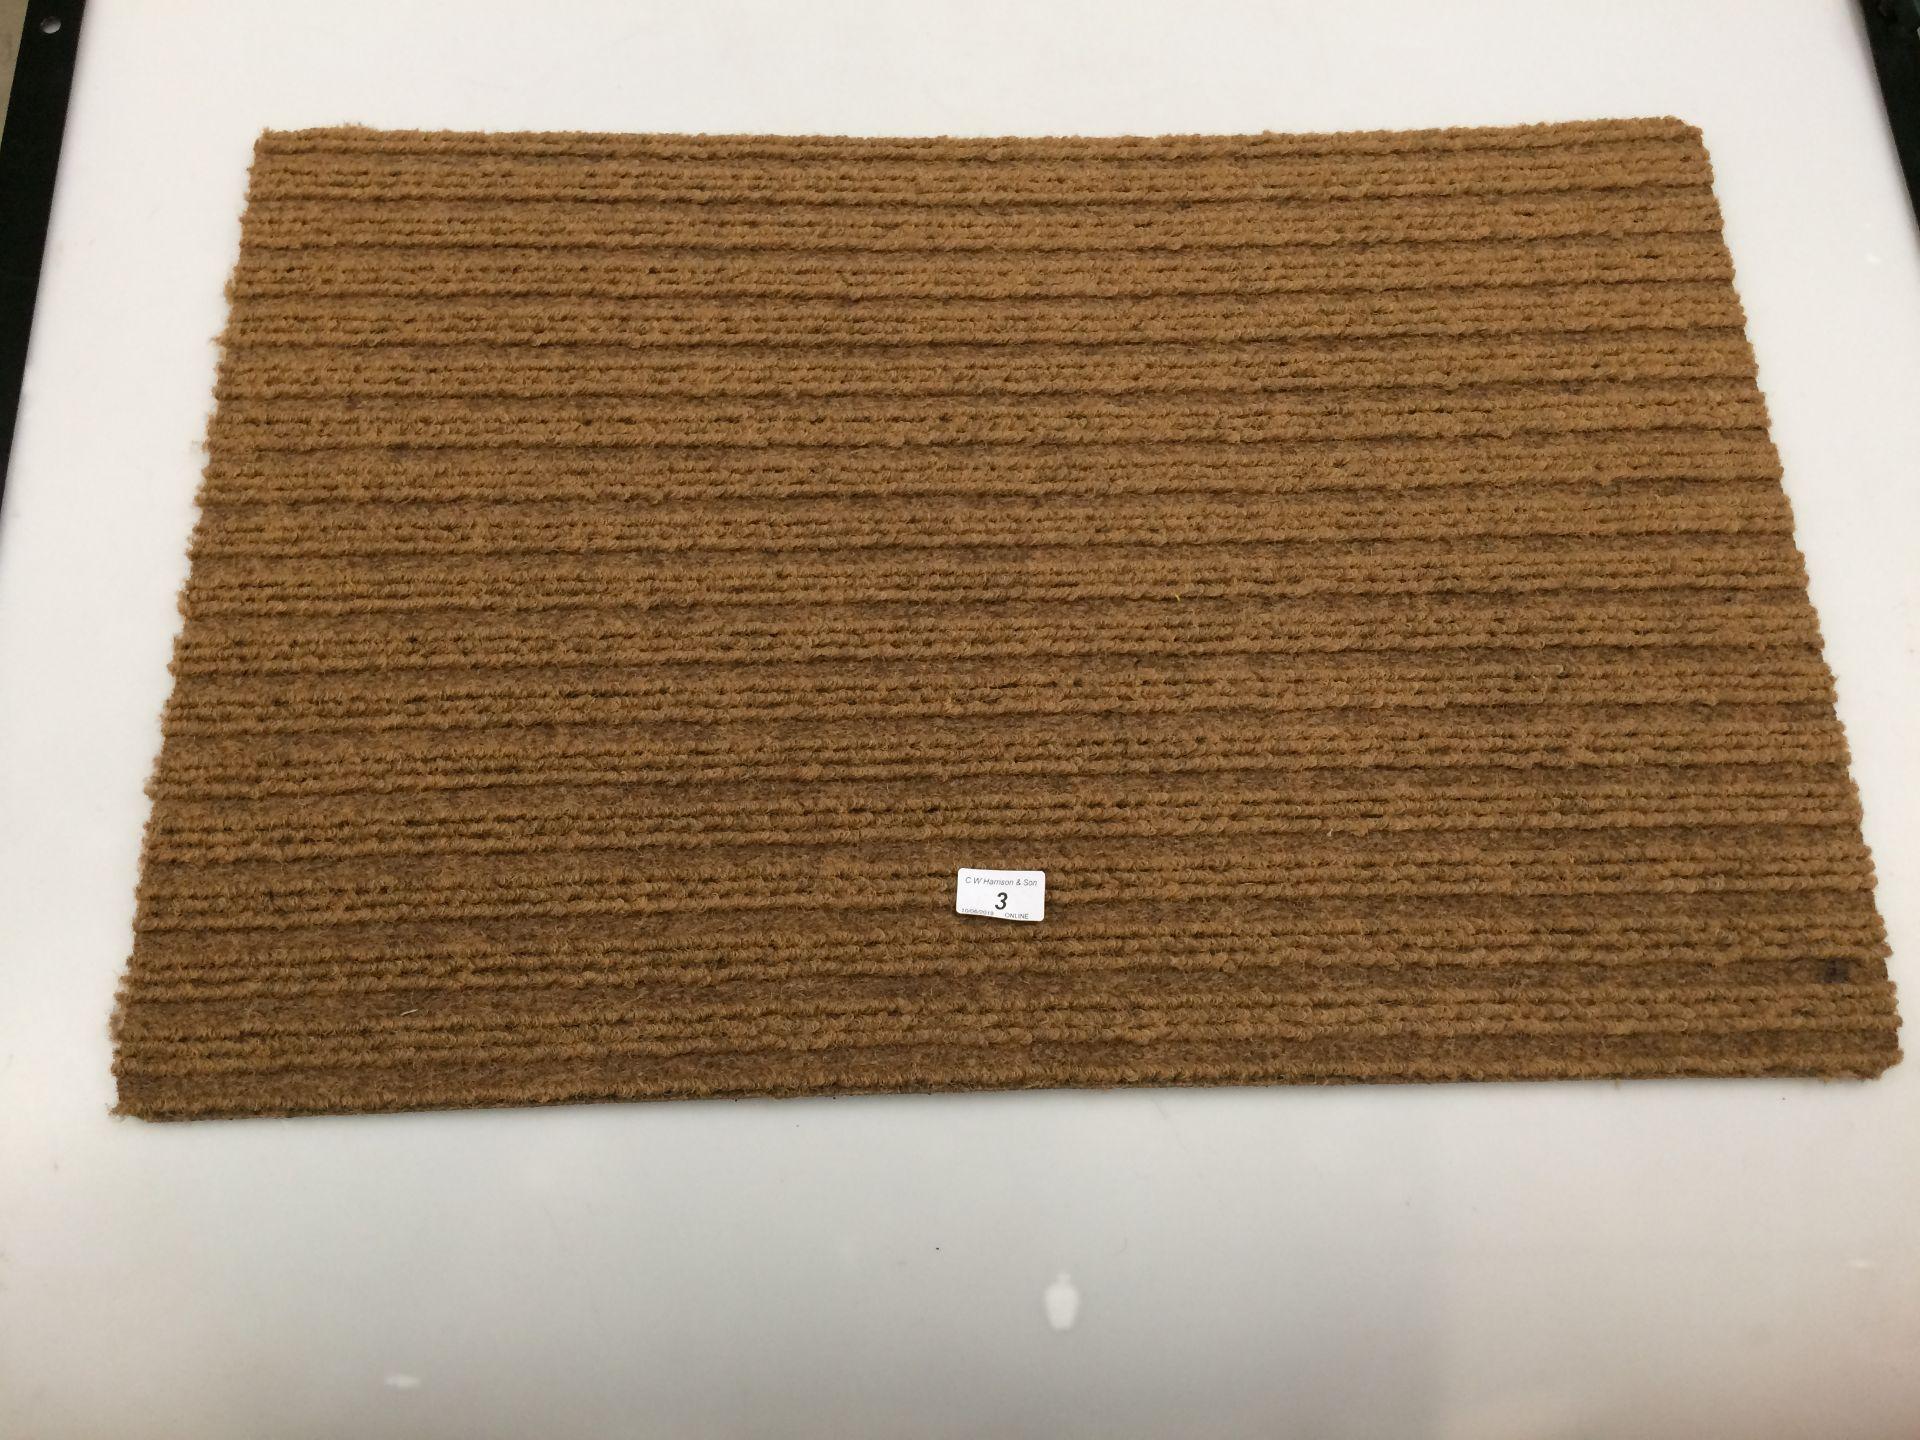 Lot 3 - 10 x brown door mats with rubber anti-slip inlay each 50 x 75cm